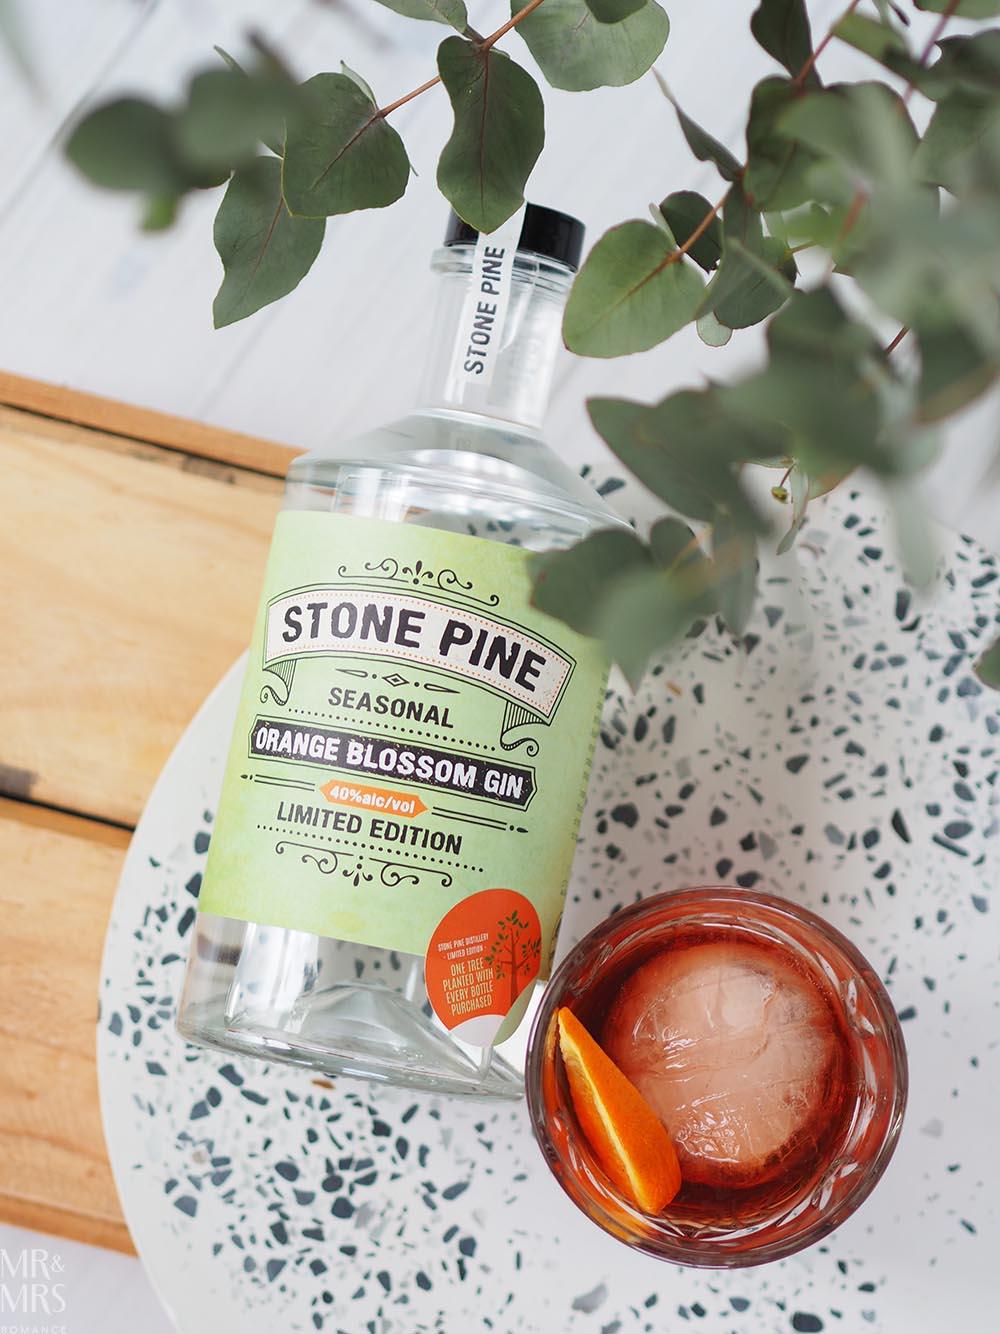 Negroni cocktail Stone Pine Orange Blossom gin